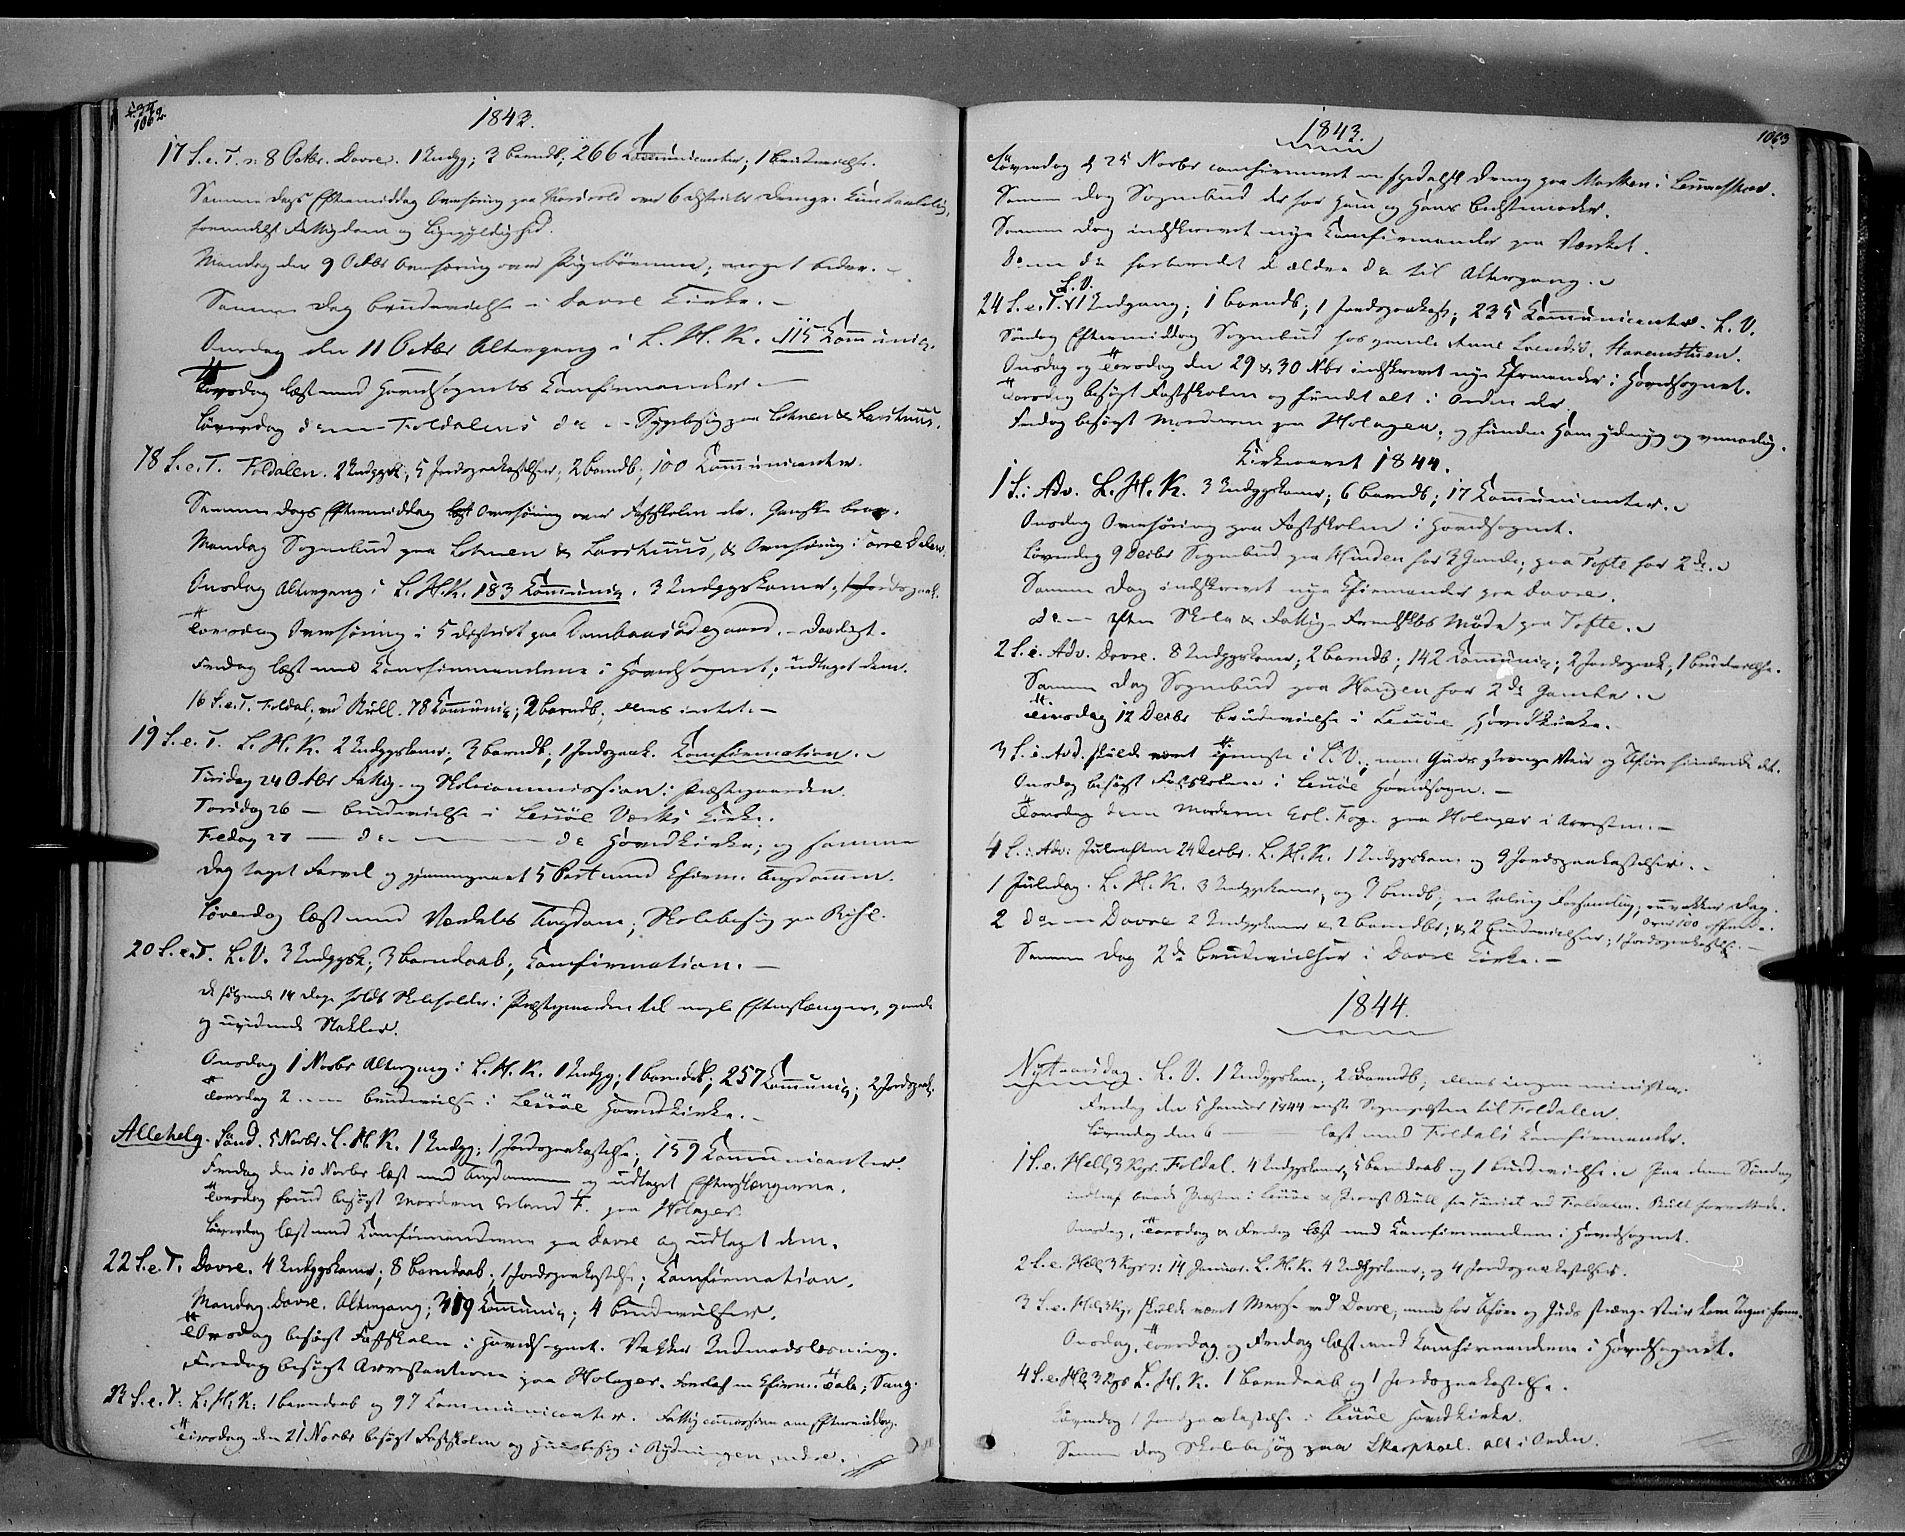 SAH, Lesja prestekontor, Ministerialbok nr. 6B, 1843-1854, s. 1062-1063